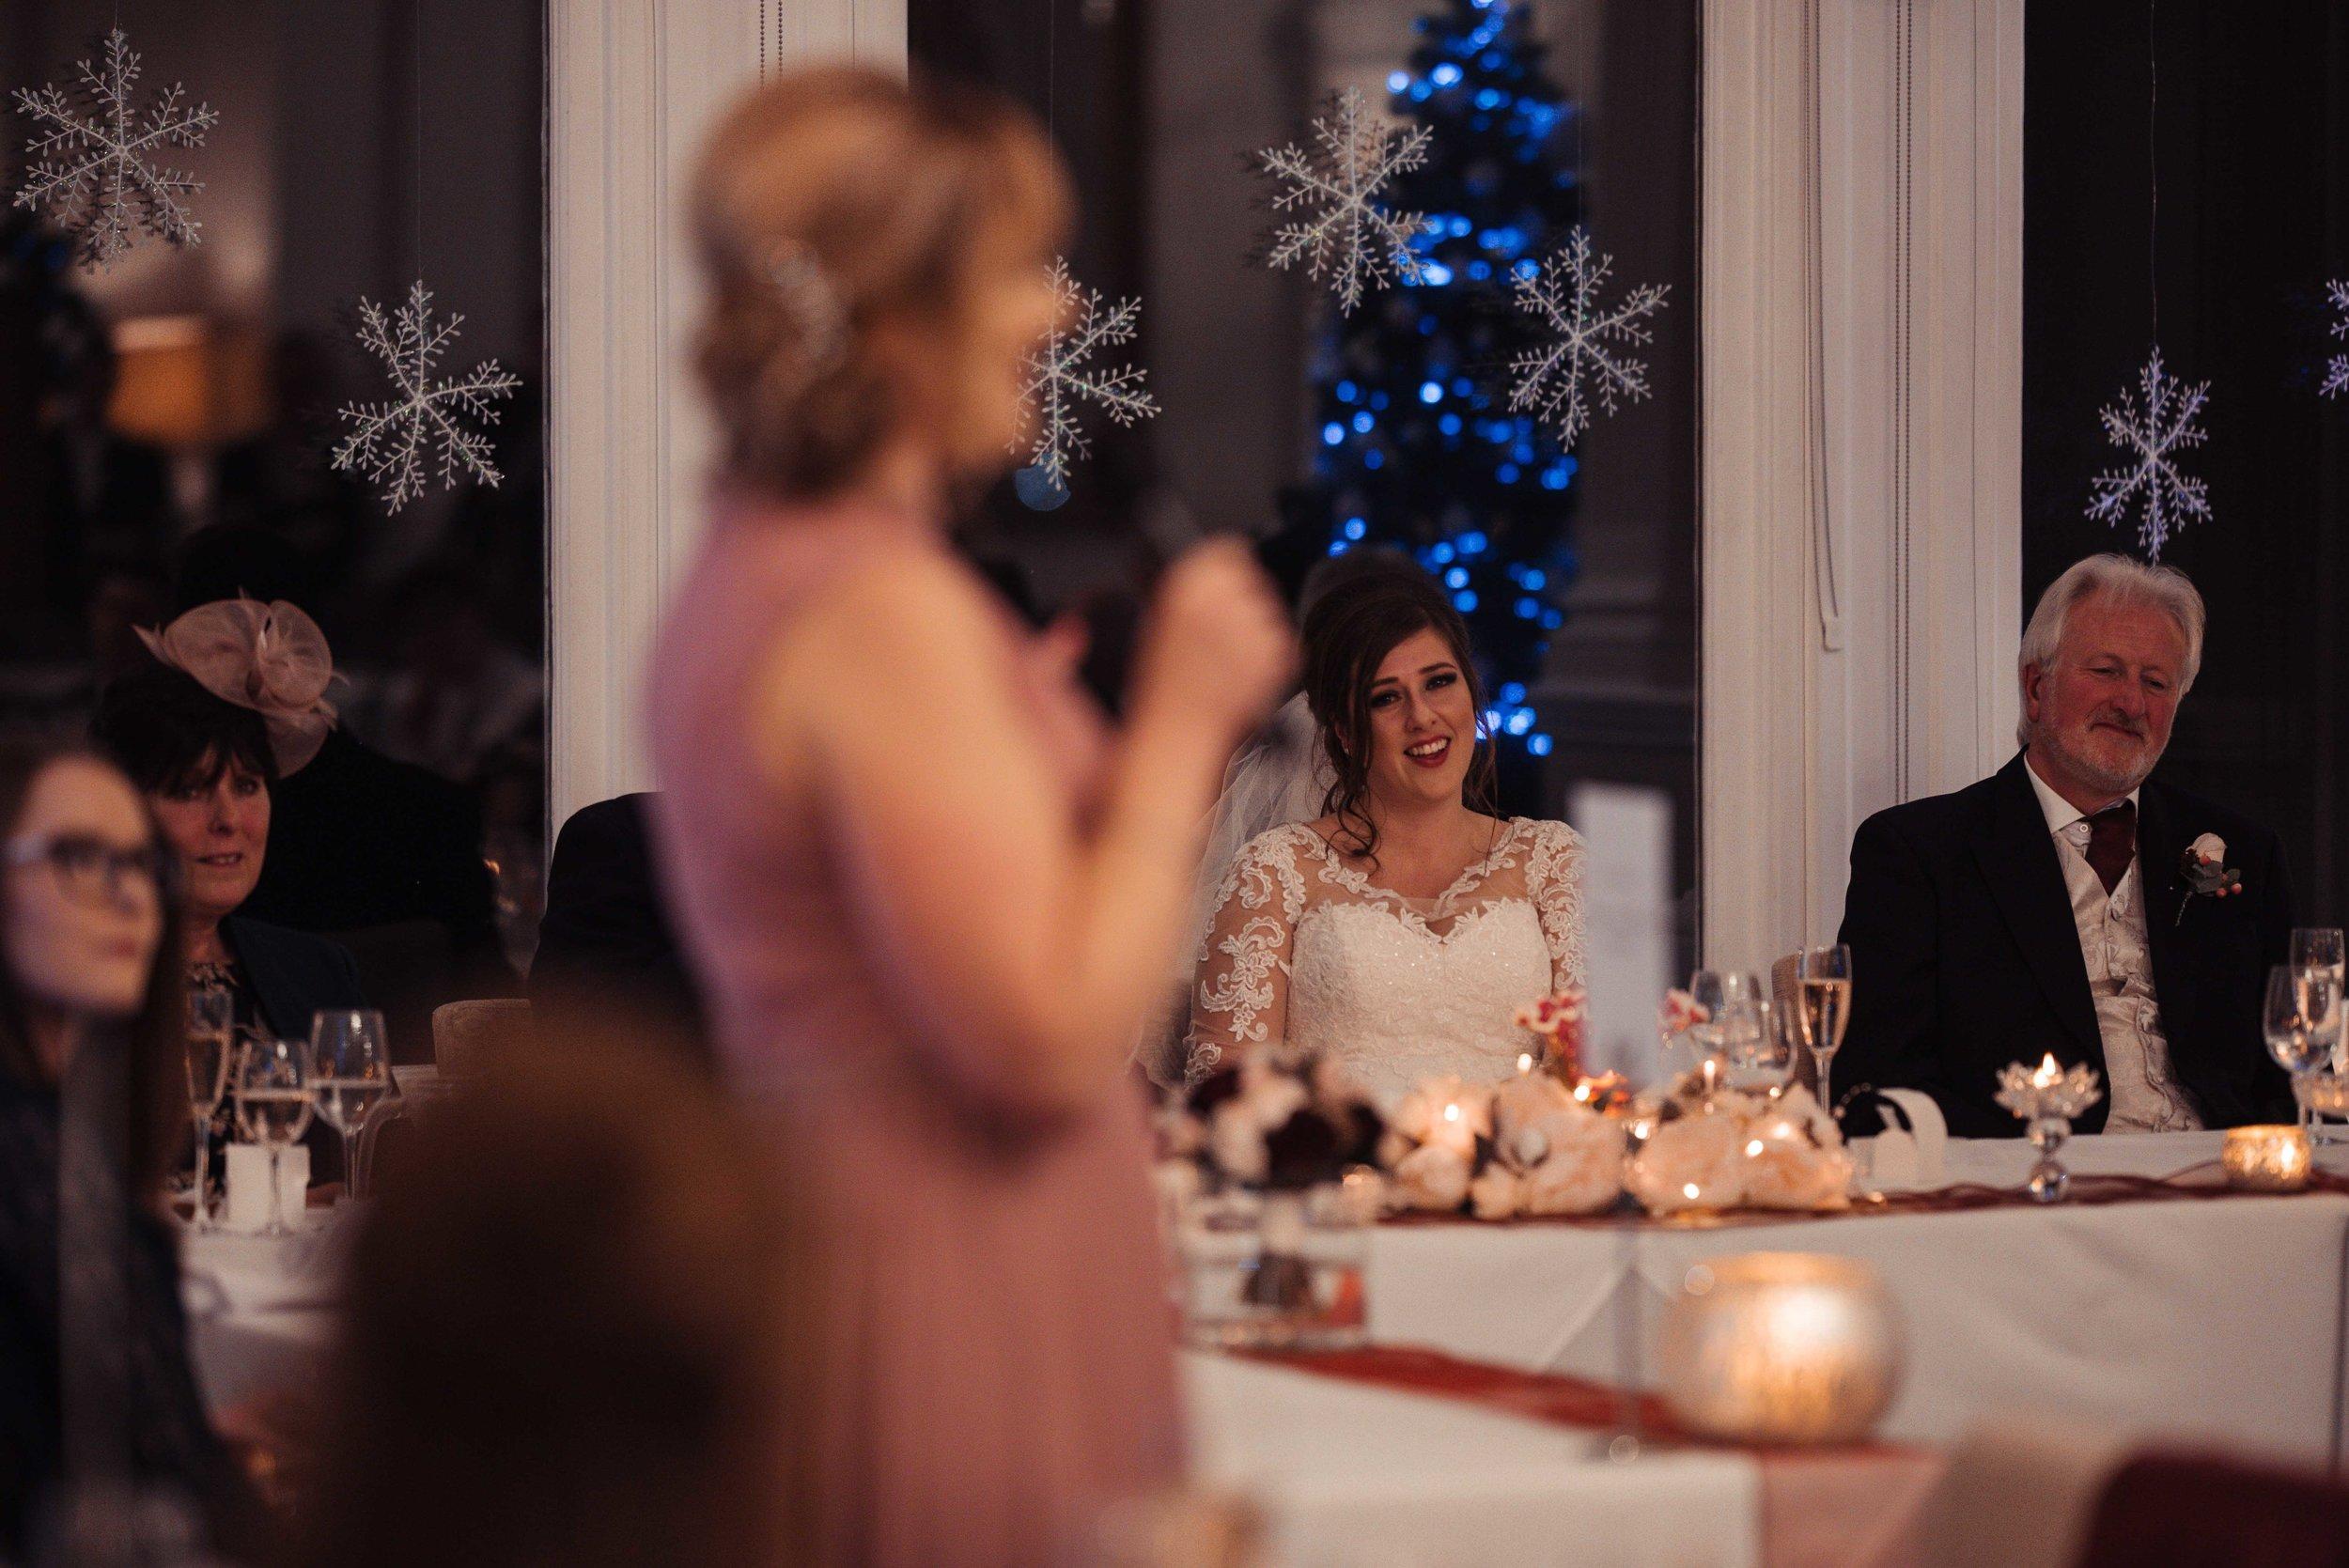 Belsfield-wedding-photography-41.jpg